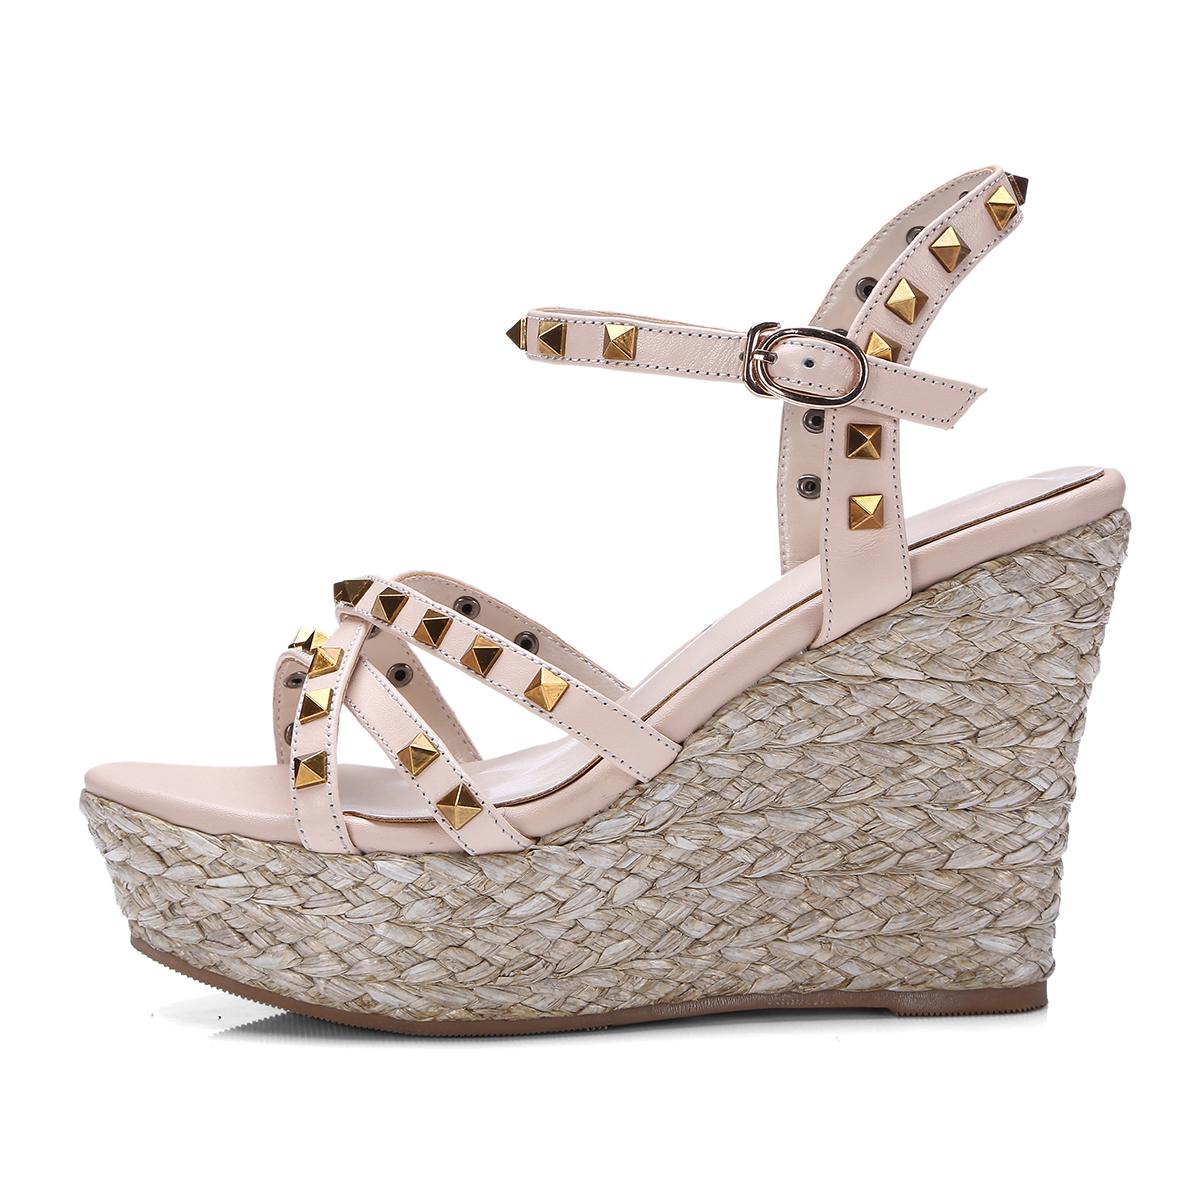 20af03feafca6 US  60 - Arden Furtado 2018 summer buckle strap rivets genuine leather  platform wedges high heels 10cm casual sandals shoes for woman new ...